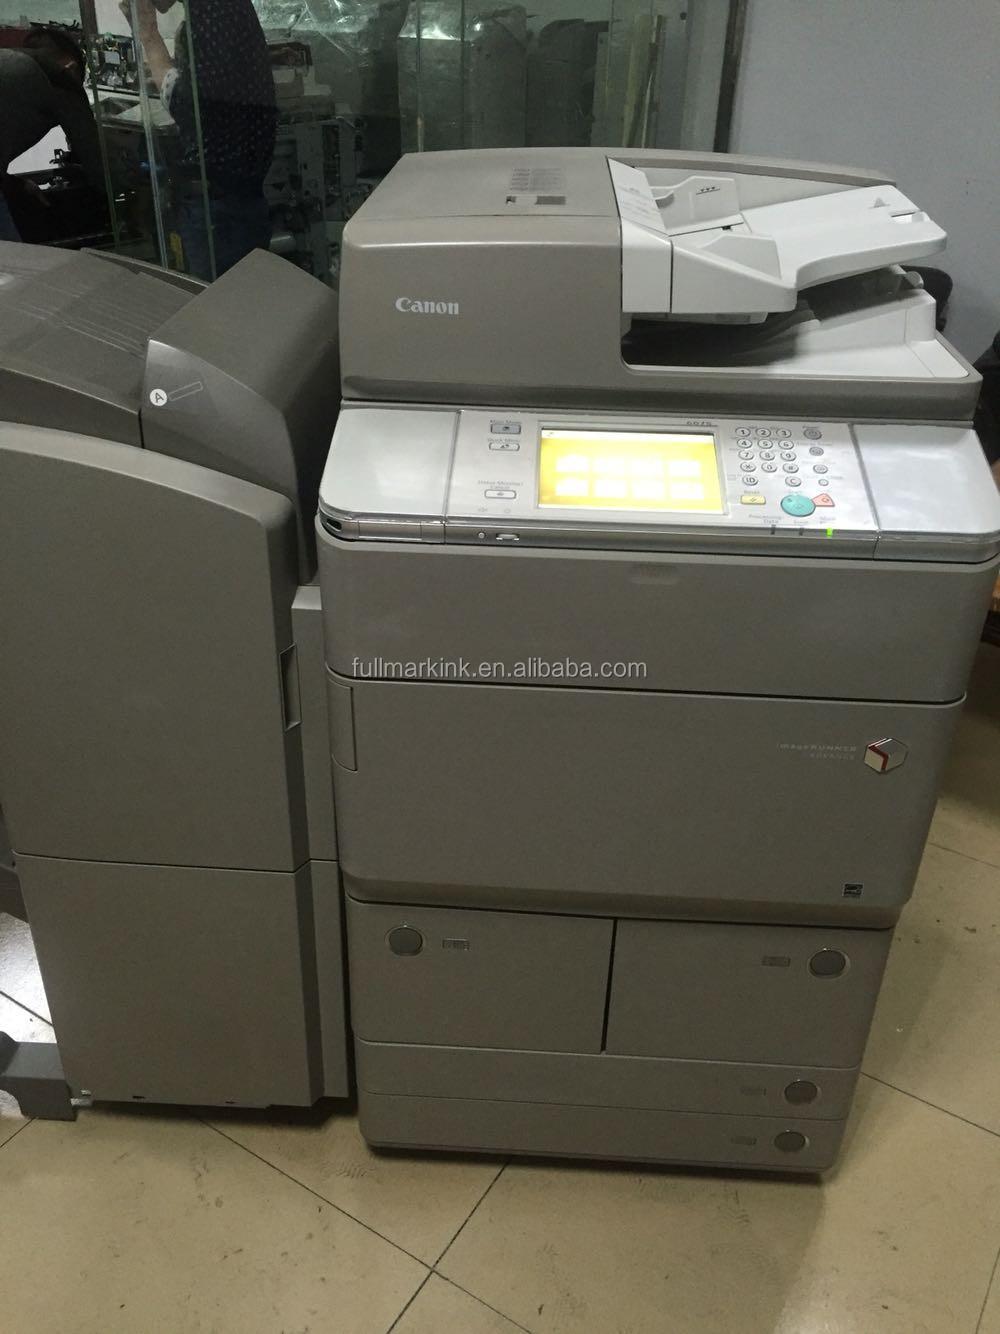 Used Ir Copiers Photocopy Machine Adv 8105 Second Hand Machines ...